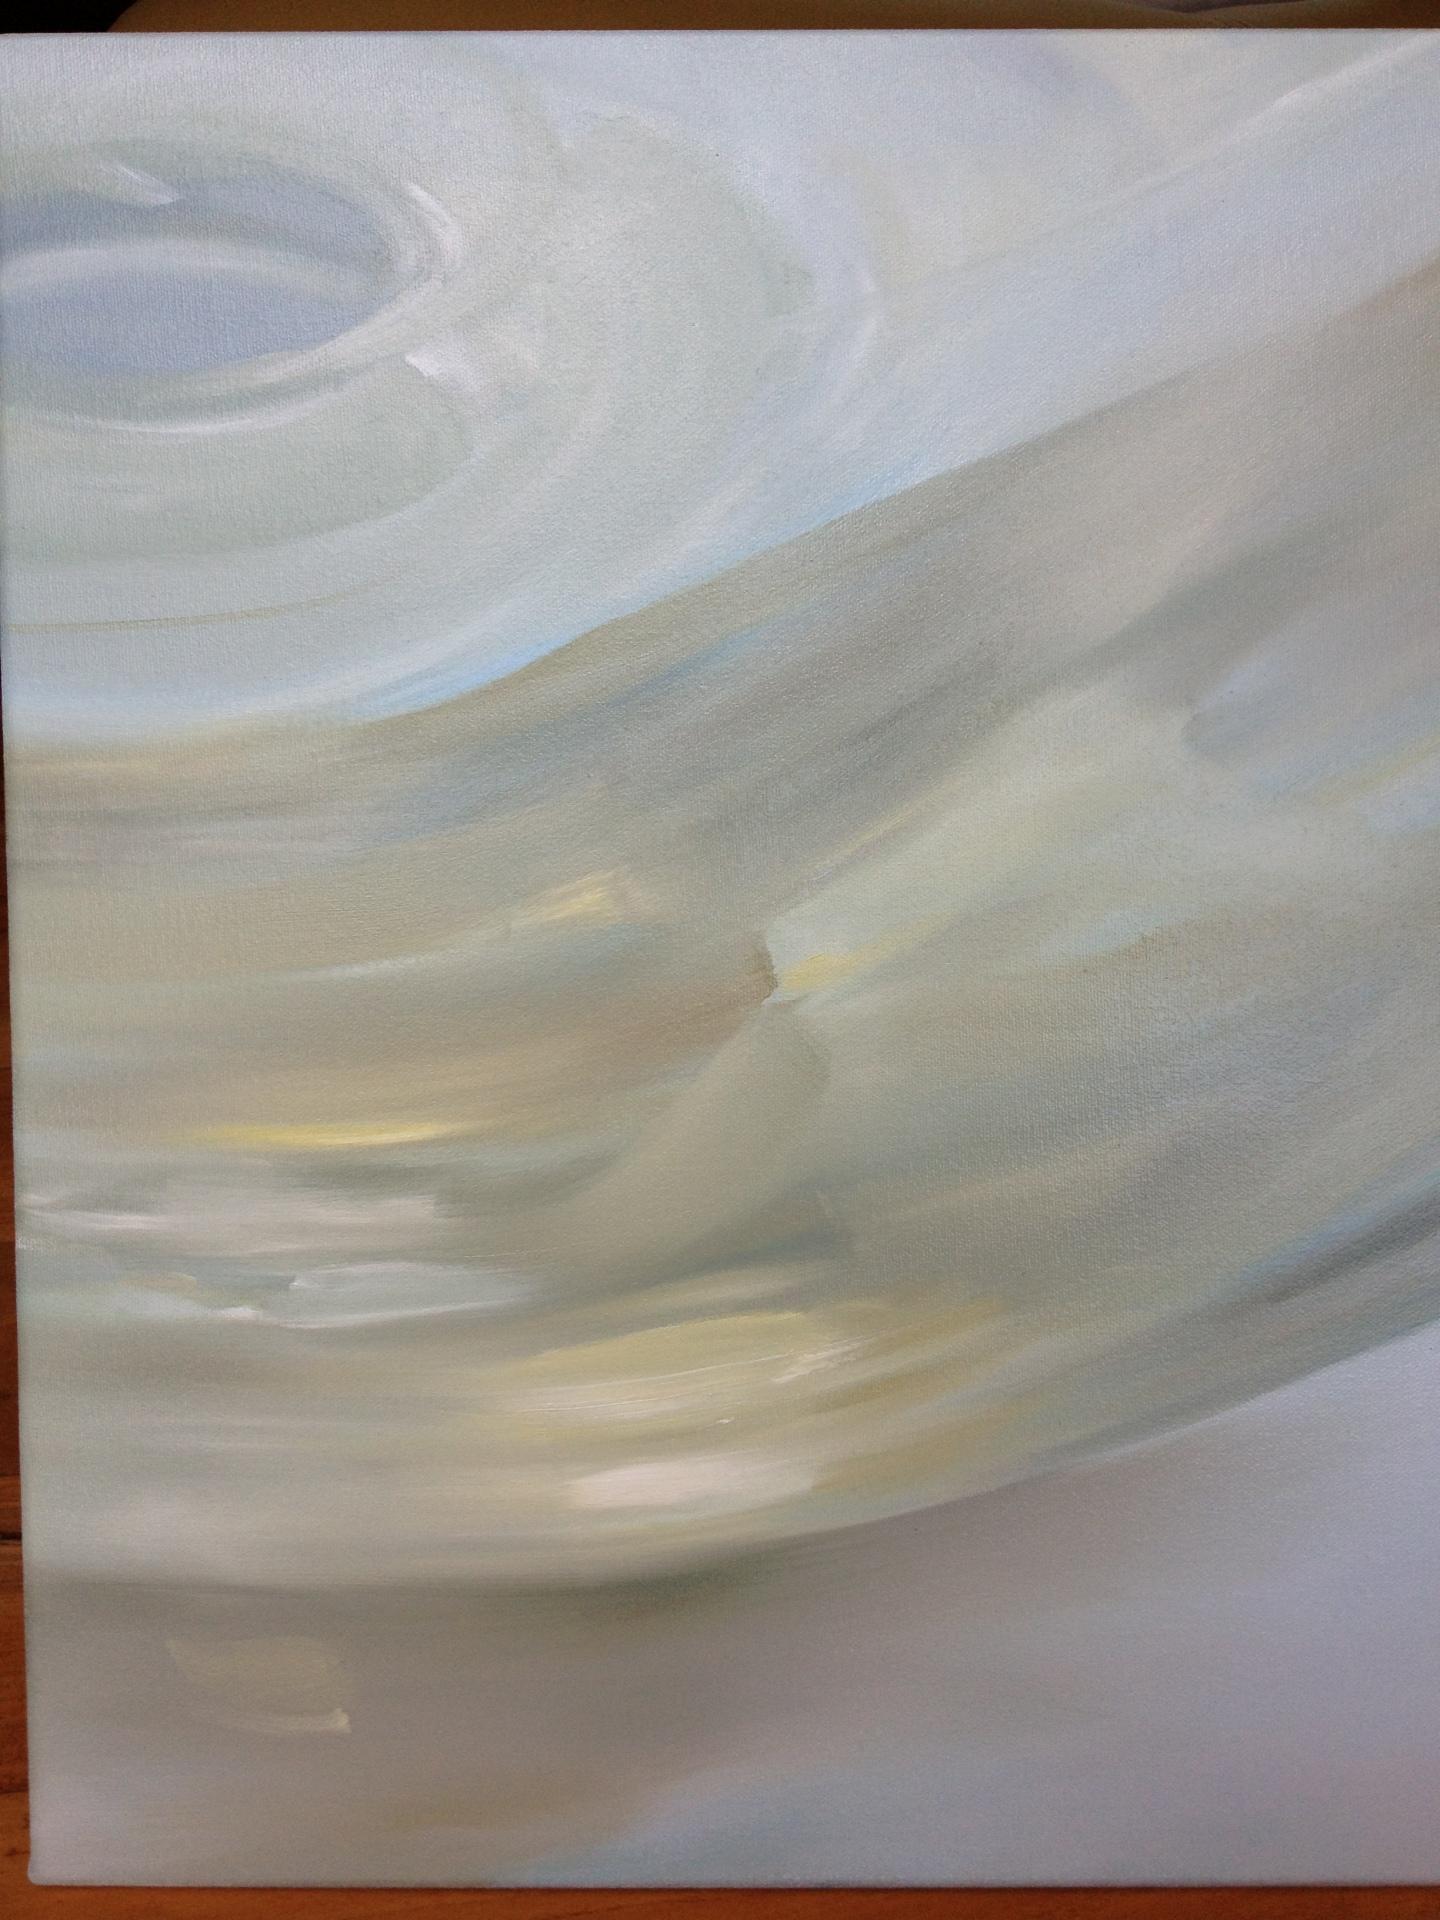 SB Glass